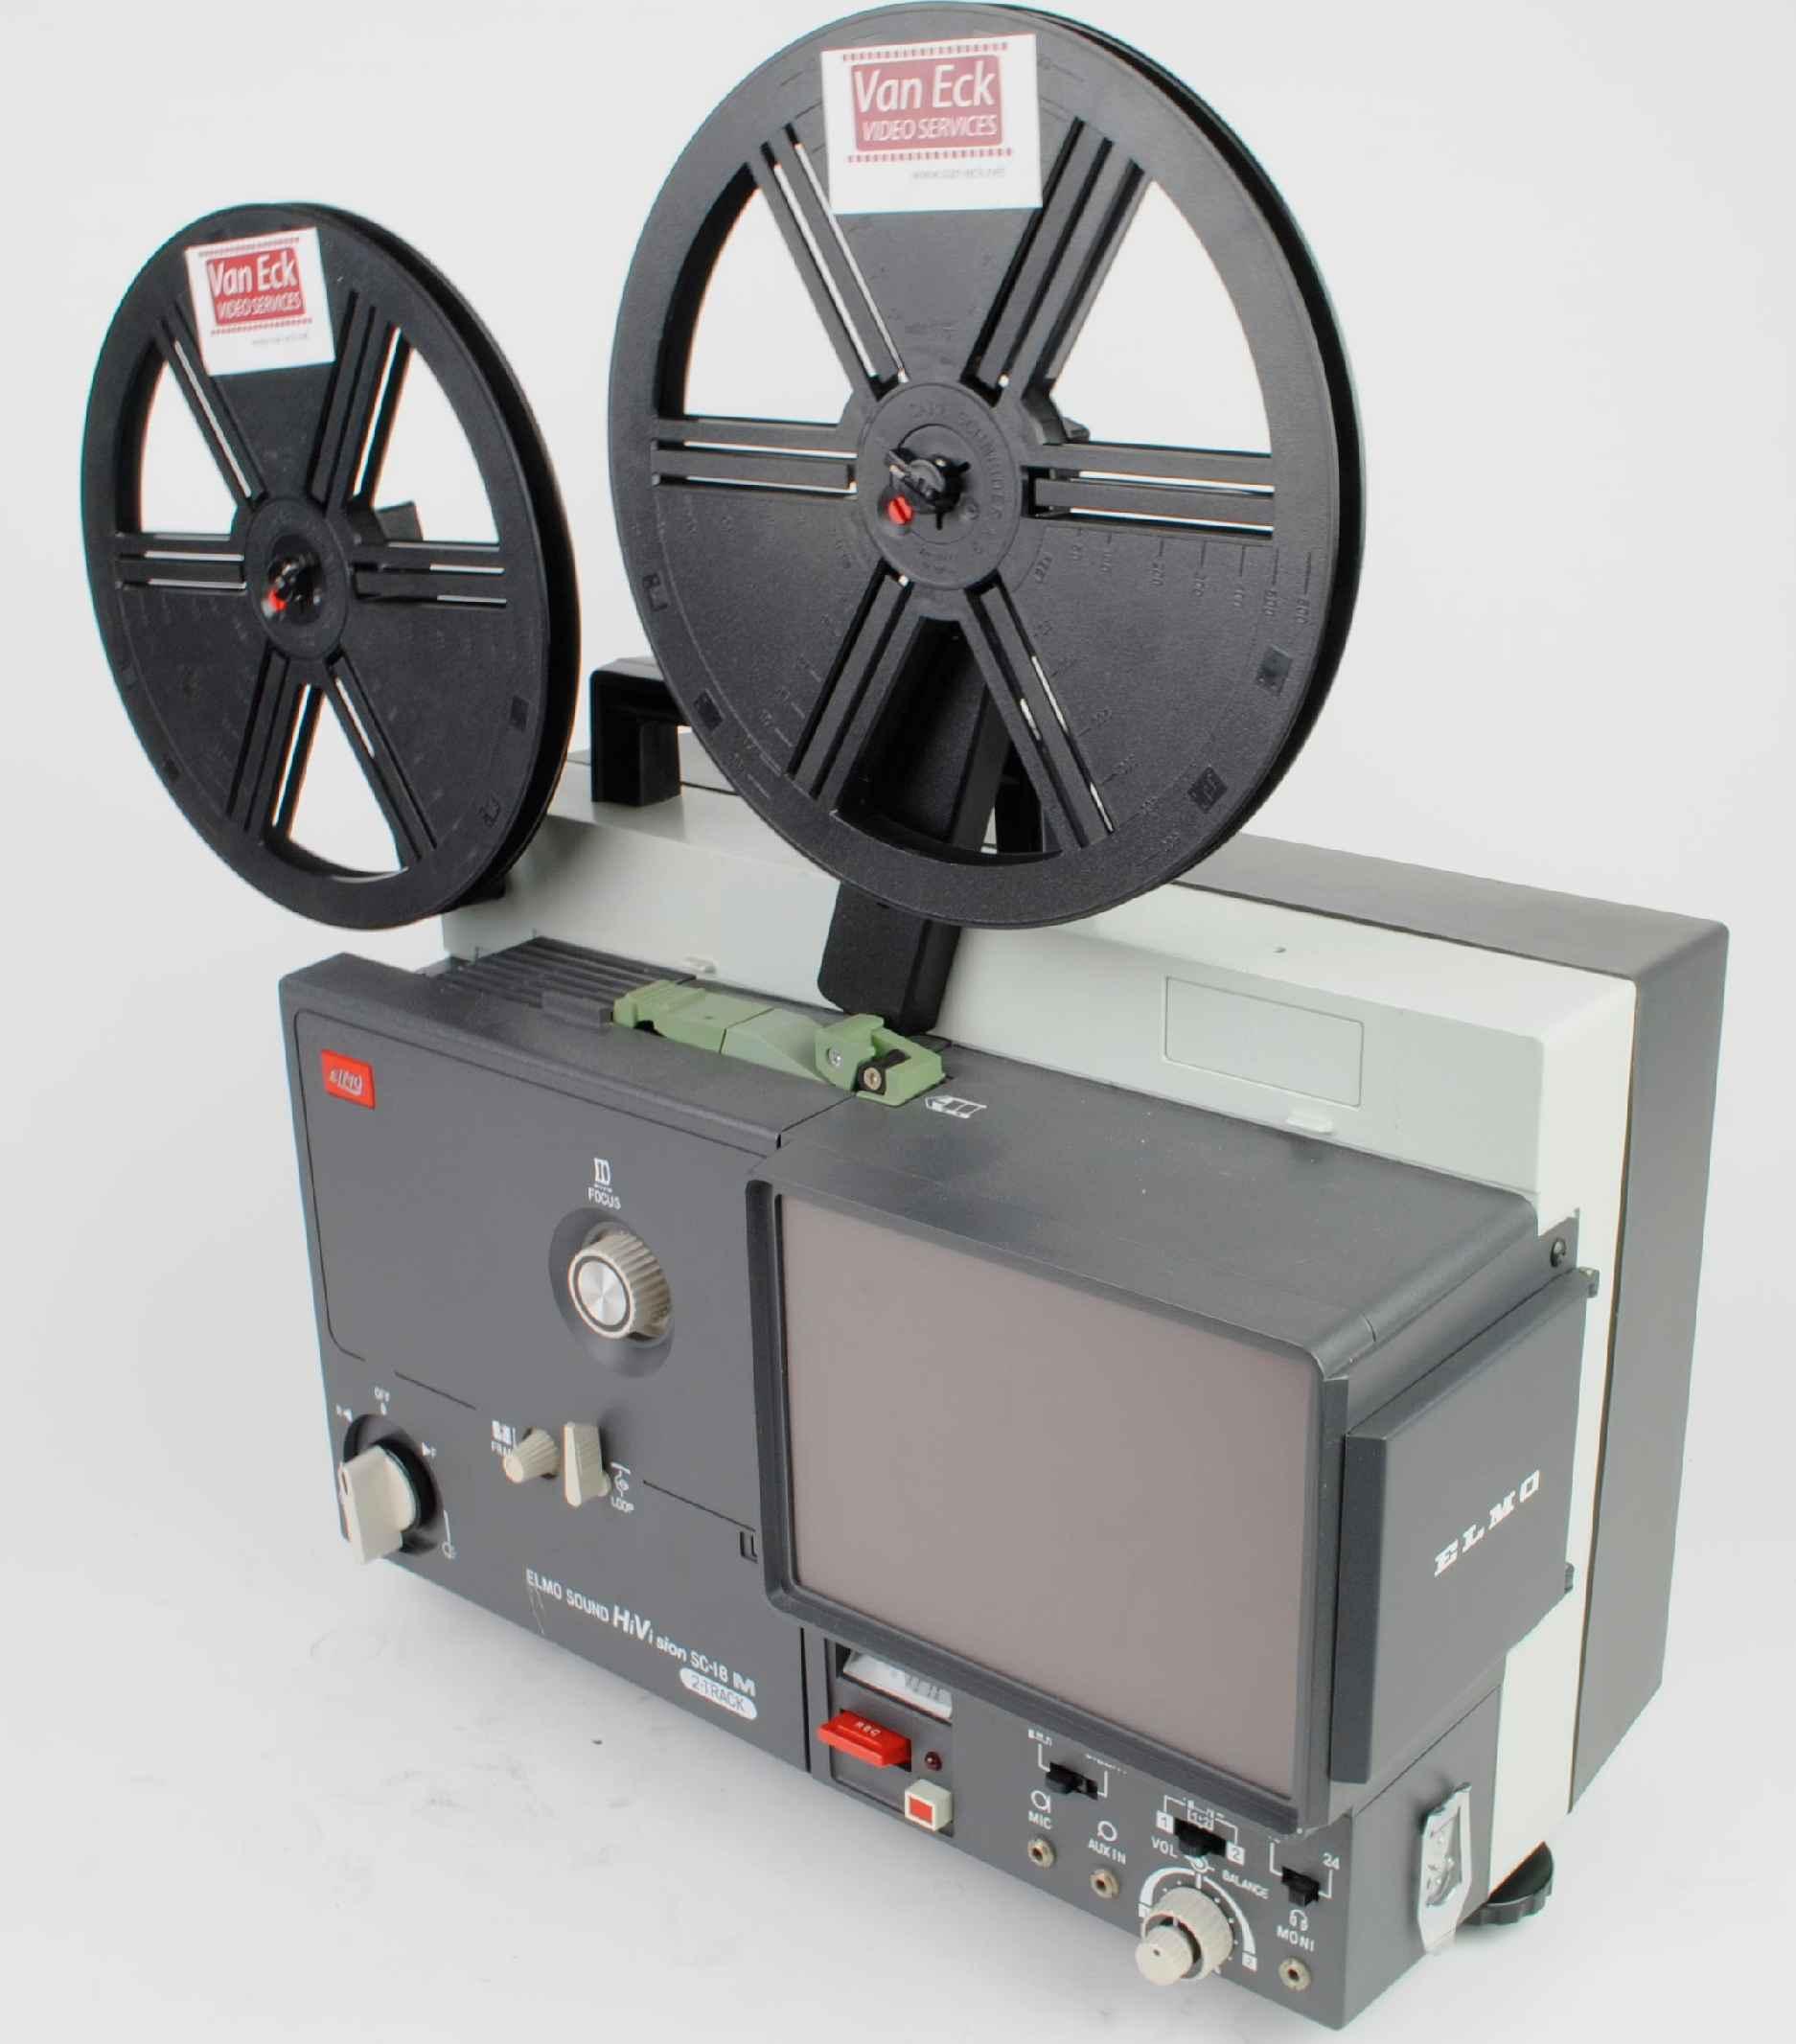 Elmo Sound Hi Vision SC-18 M 2-Track marketed in 1983 super 8 mm film